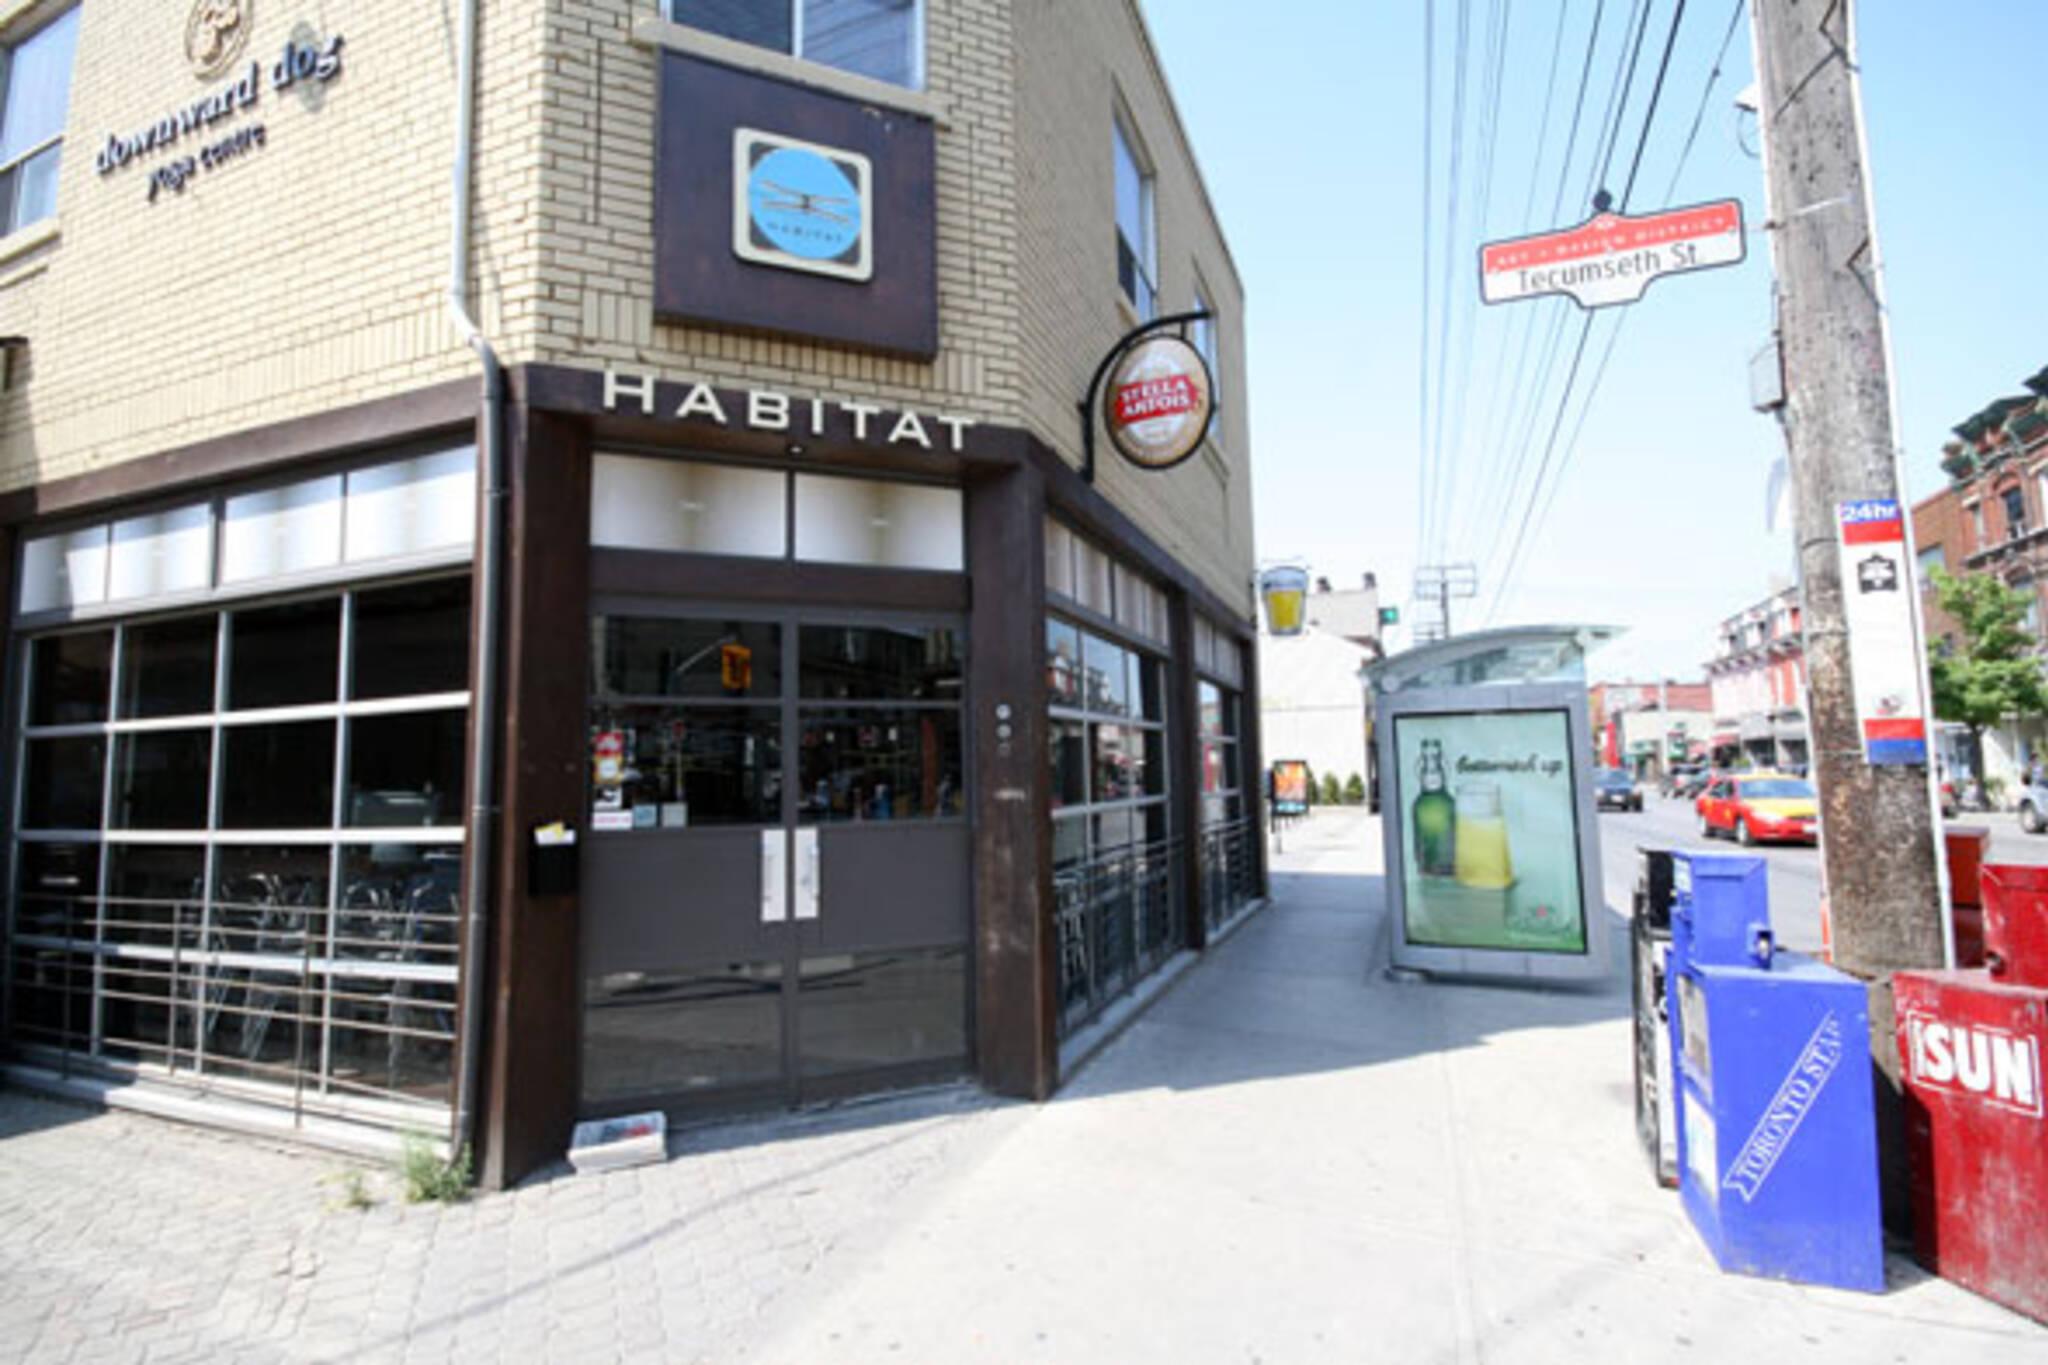 Habitat Restaurant Toronto